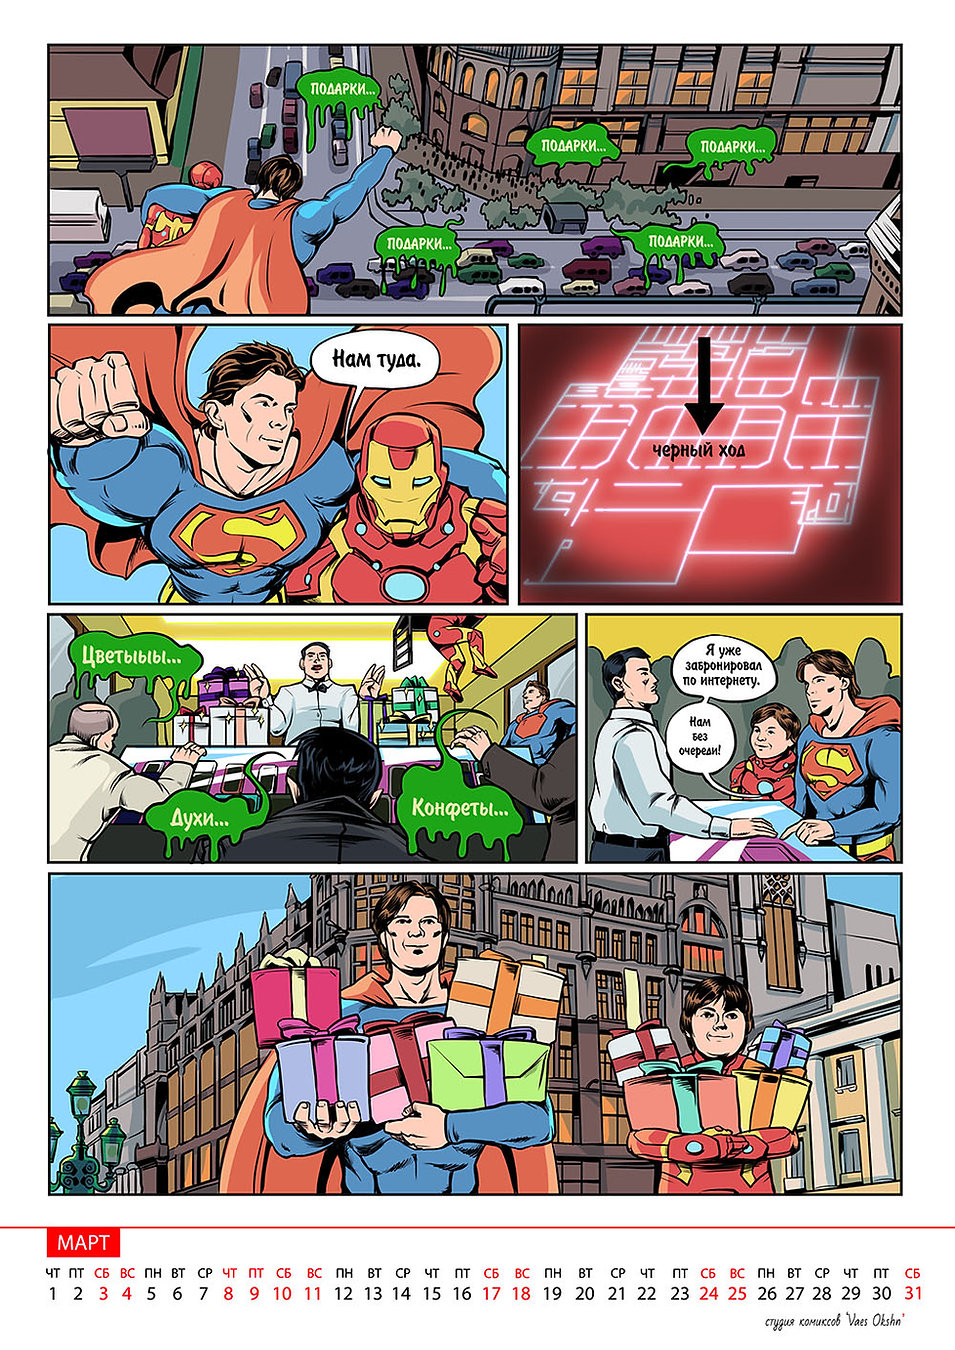 Комикс календарь март. Комиксы на заказ